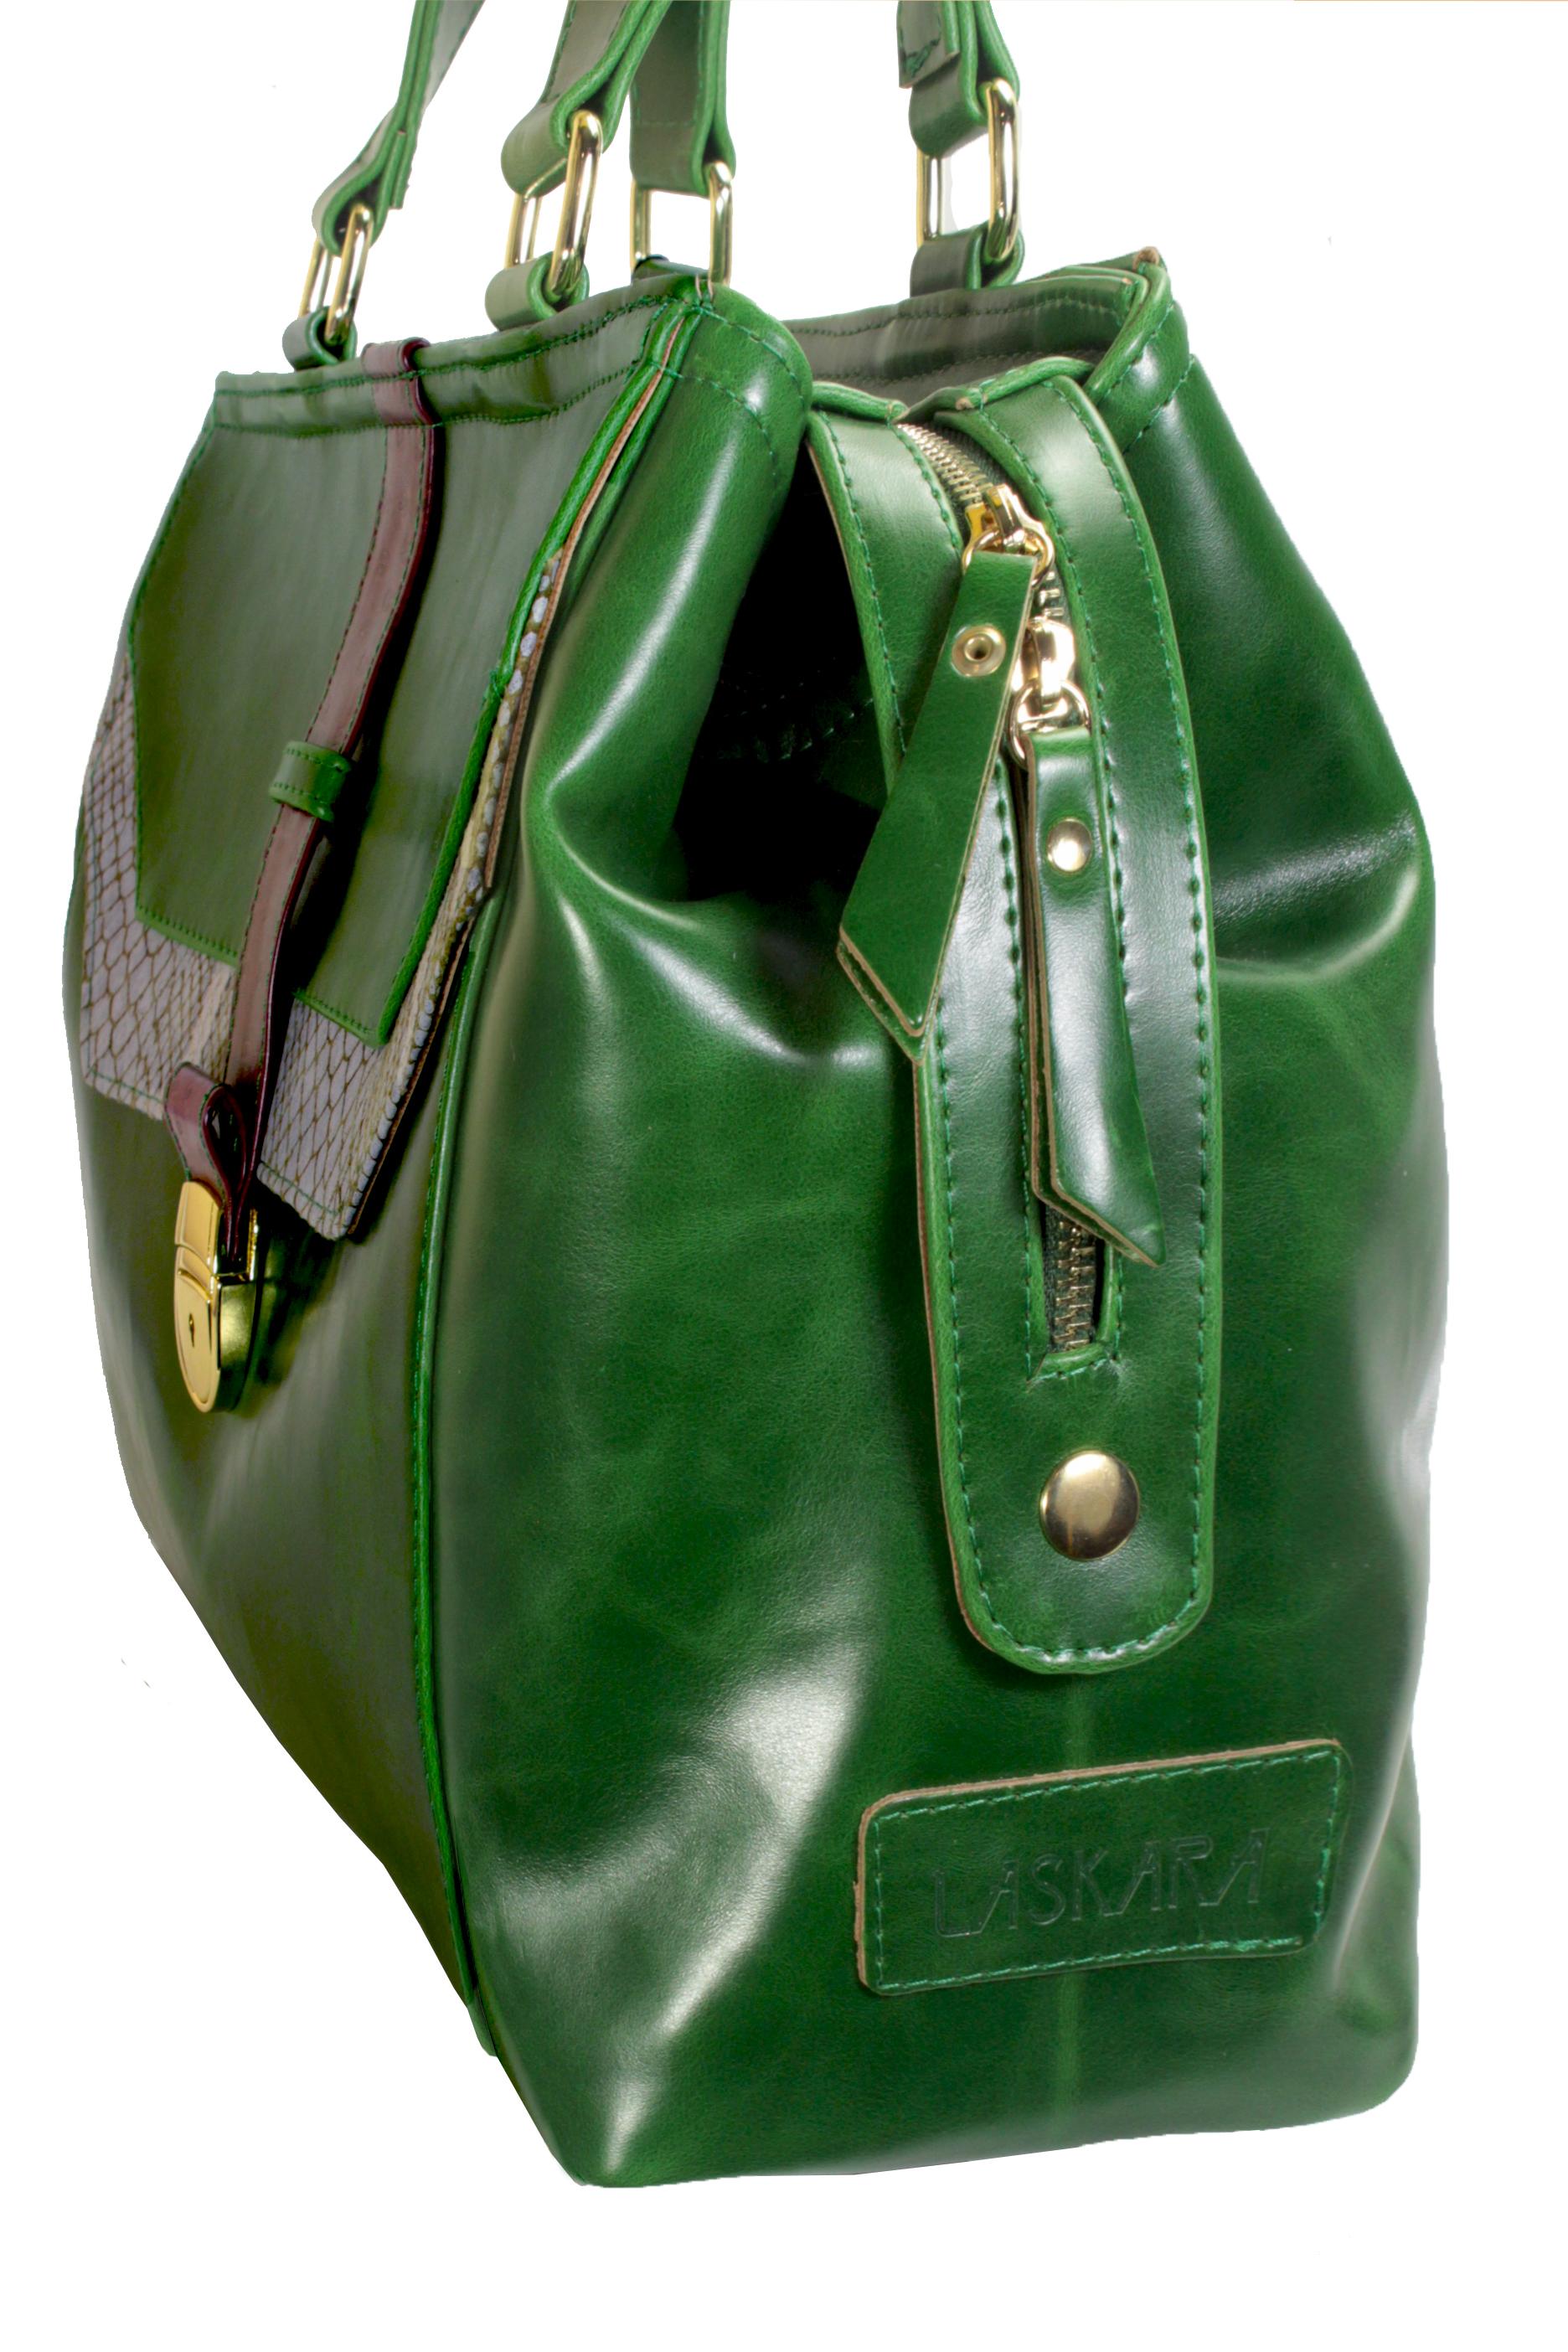 Atypická zelená kabelka 11-20287-green - detail